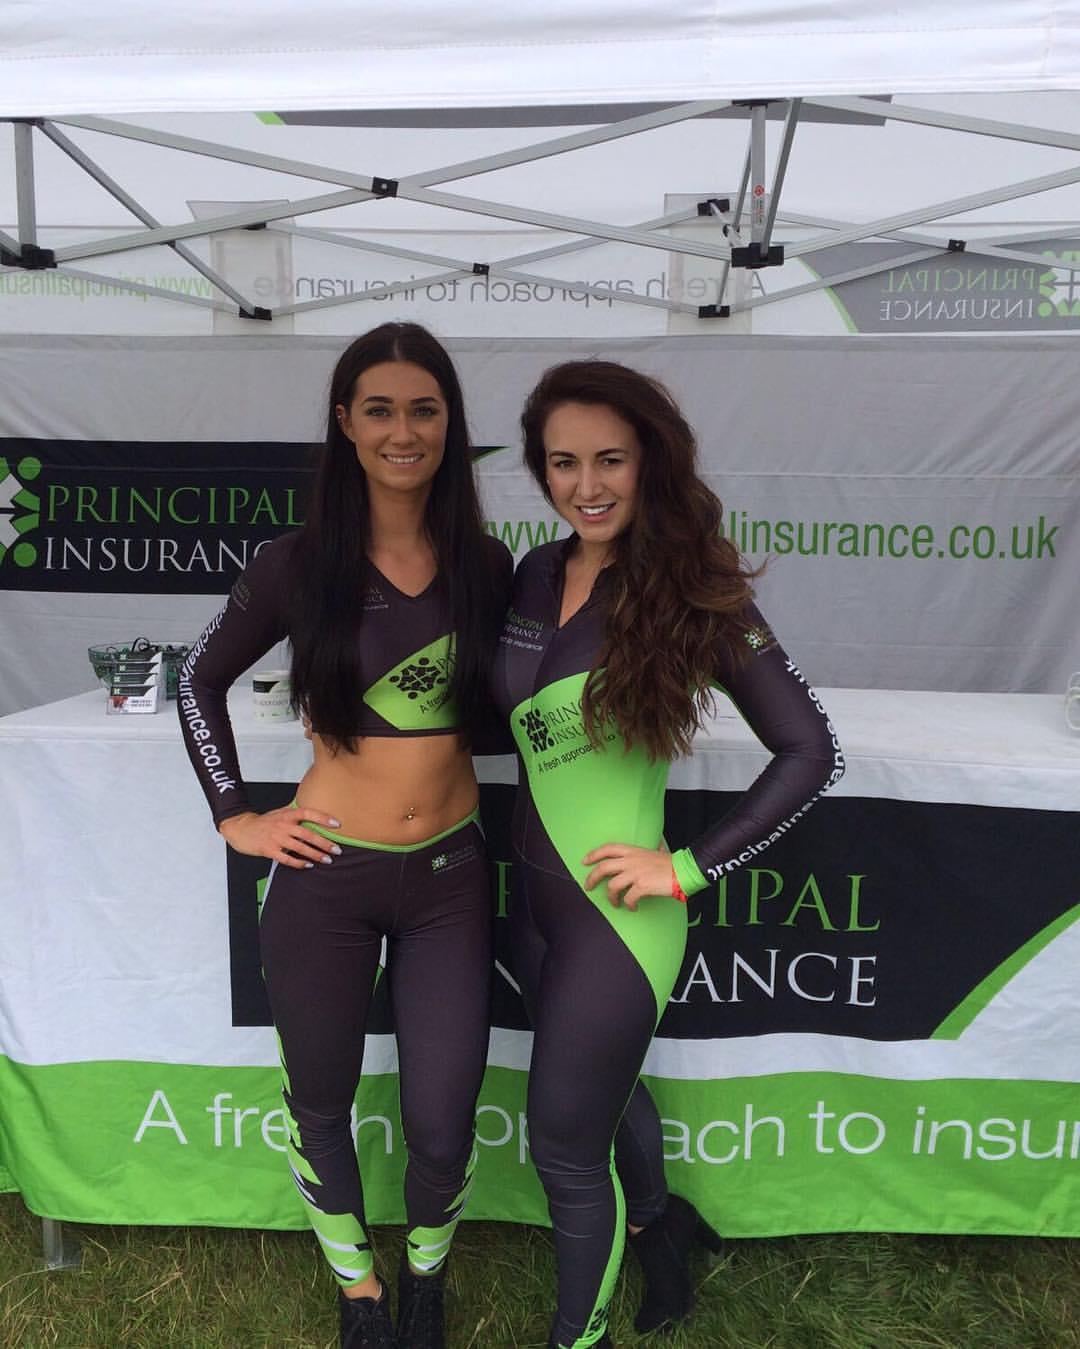 Principal Insurance Girls at the Rock and Bike Festival